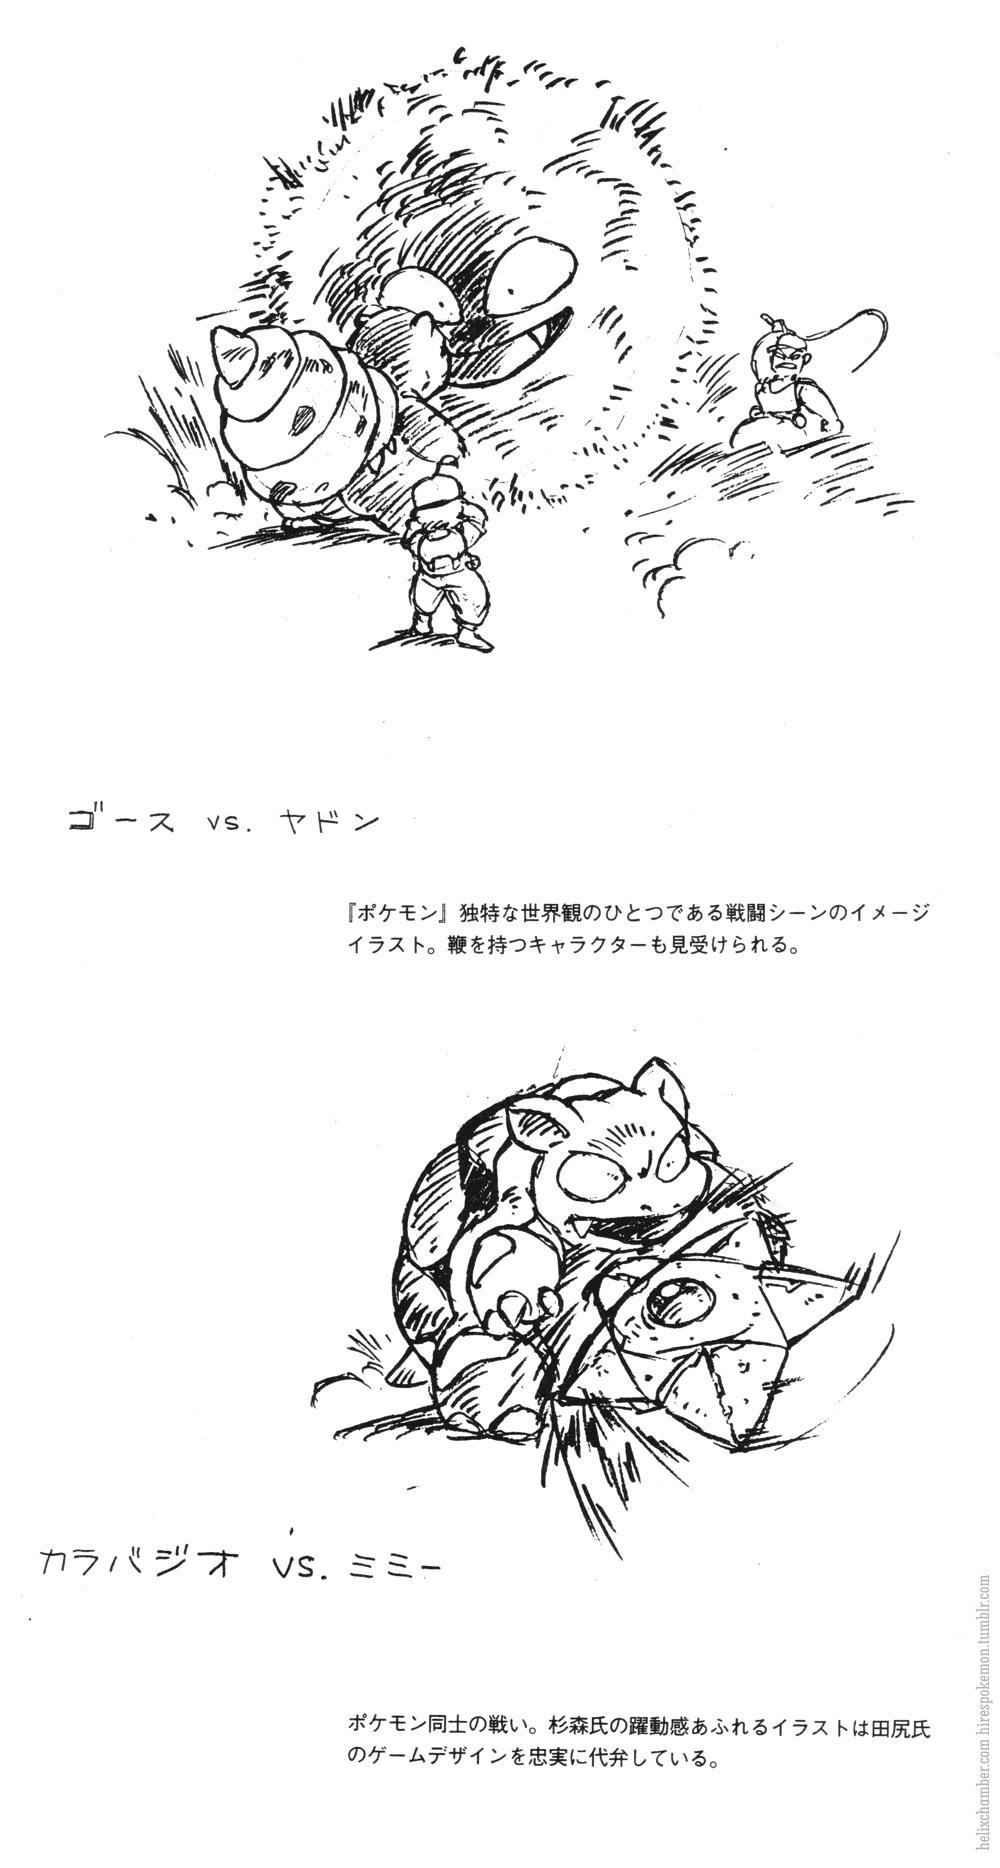 1990_Capsule_Monsters_18_Cover_reg